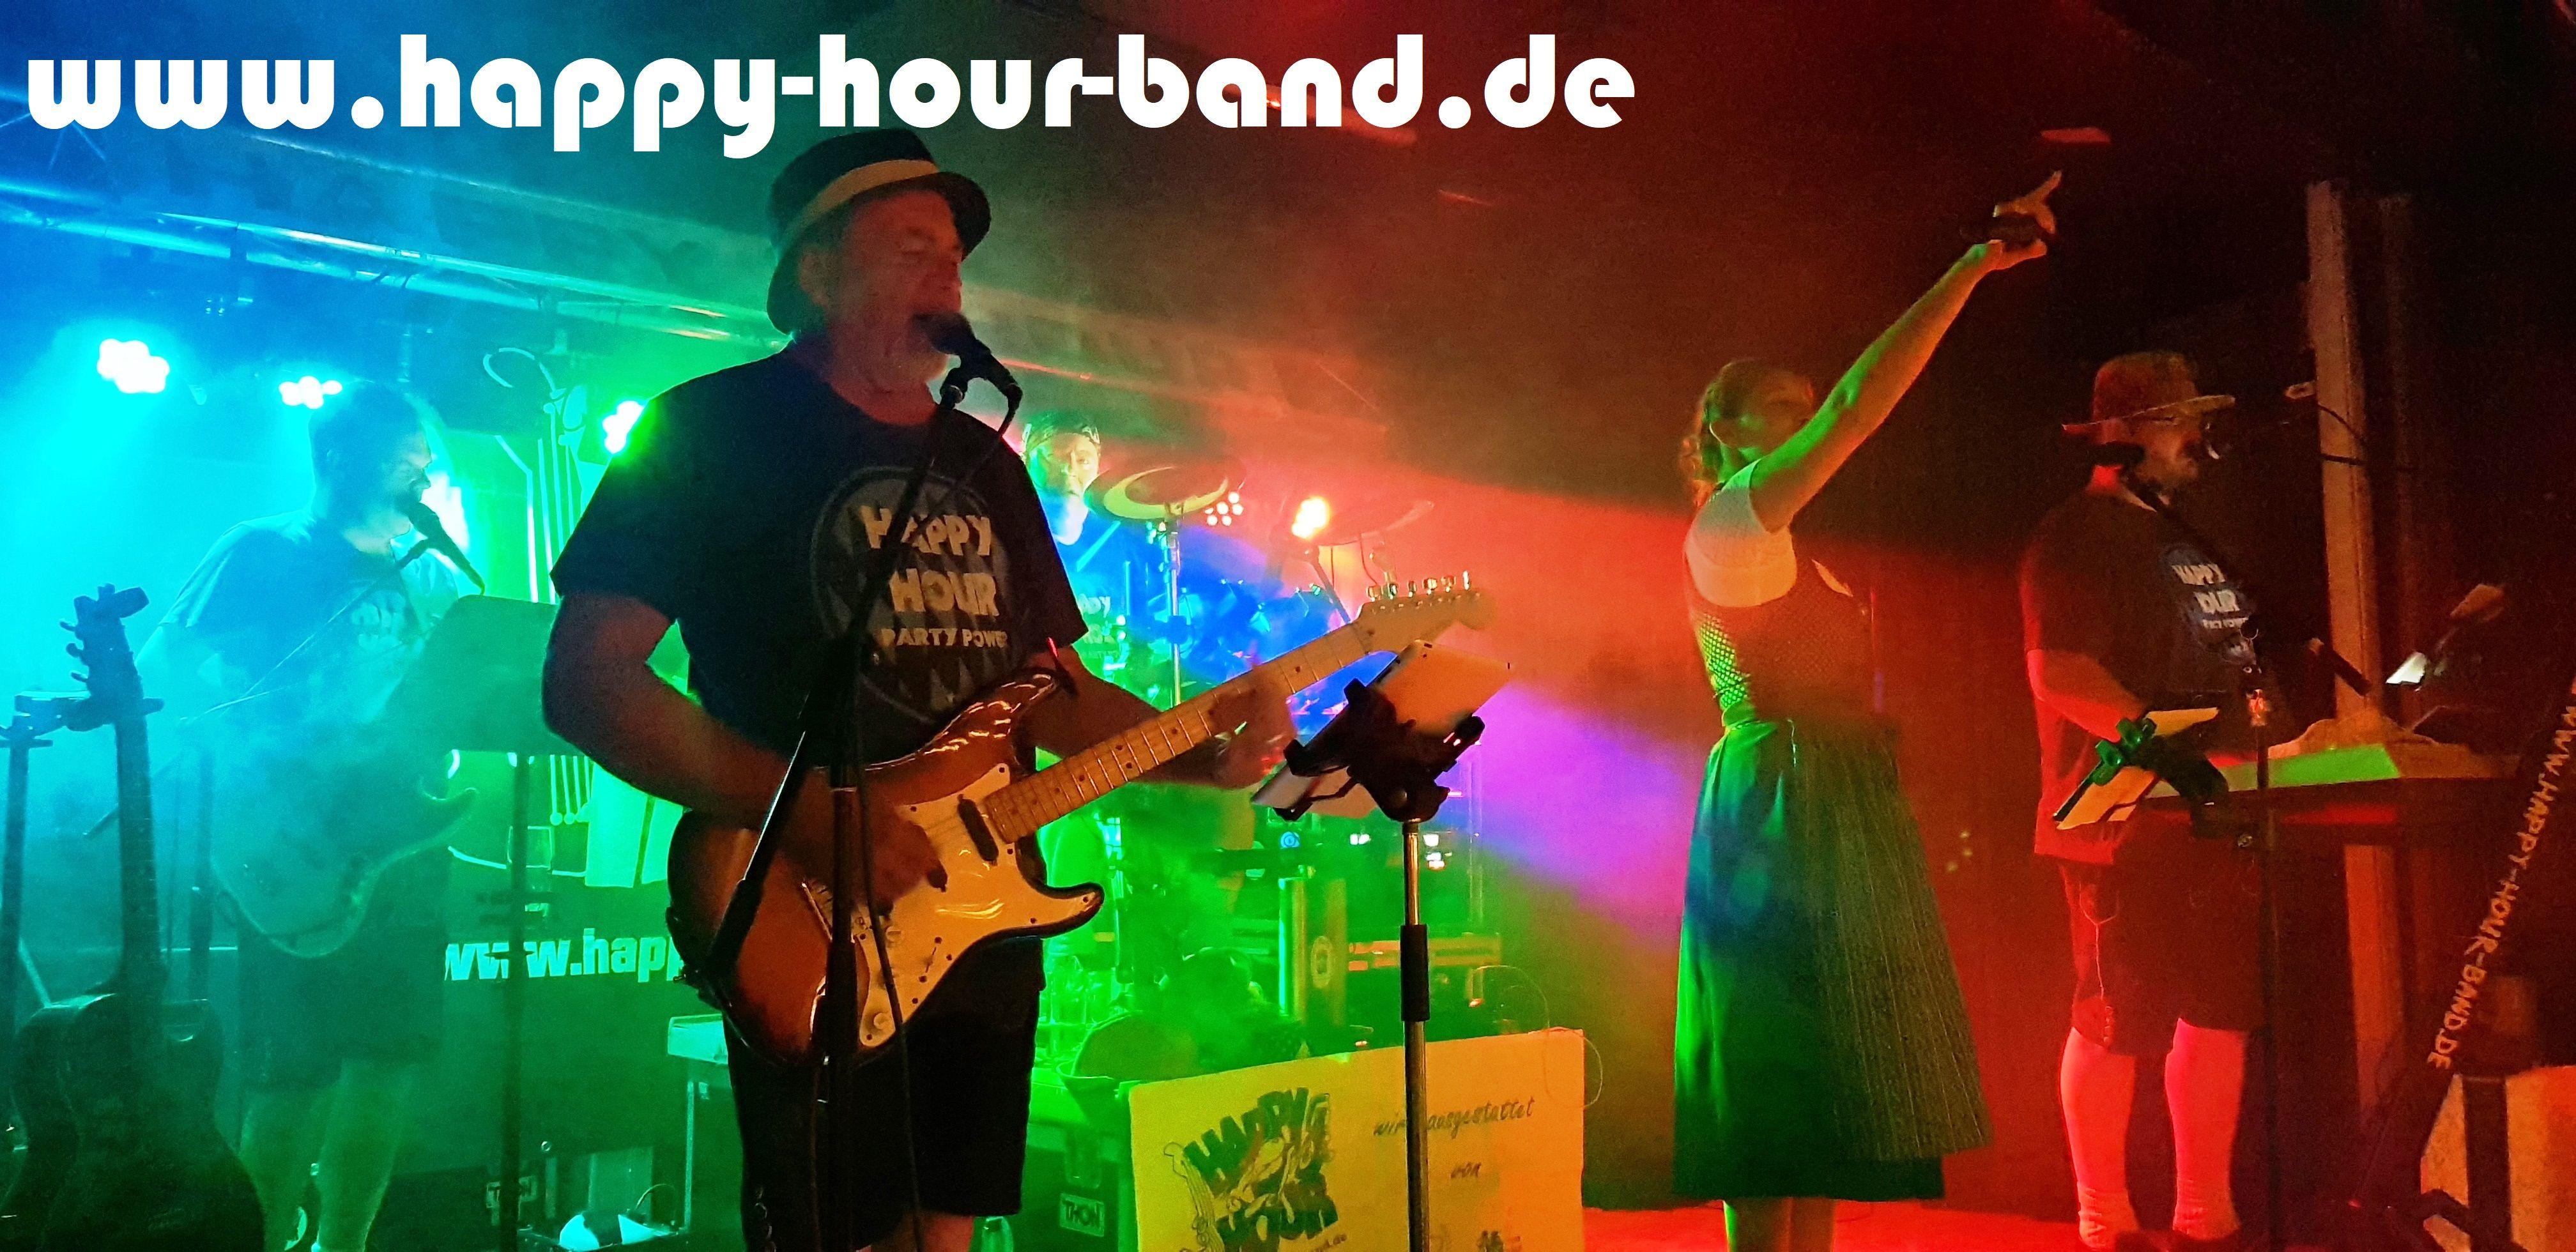 Happy Hour Oktoberfestband Partyband Hochzeitsband Www Happy Hour Band De Www Oktoberfestband International Hochzeitsband Bayern Happy Hour Band